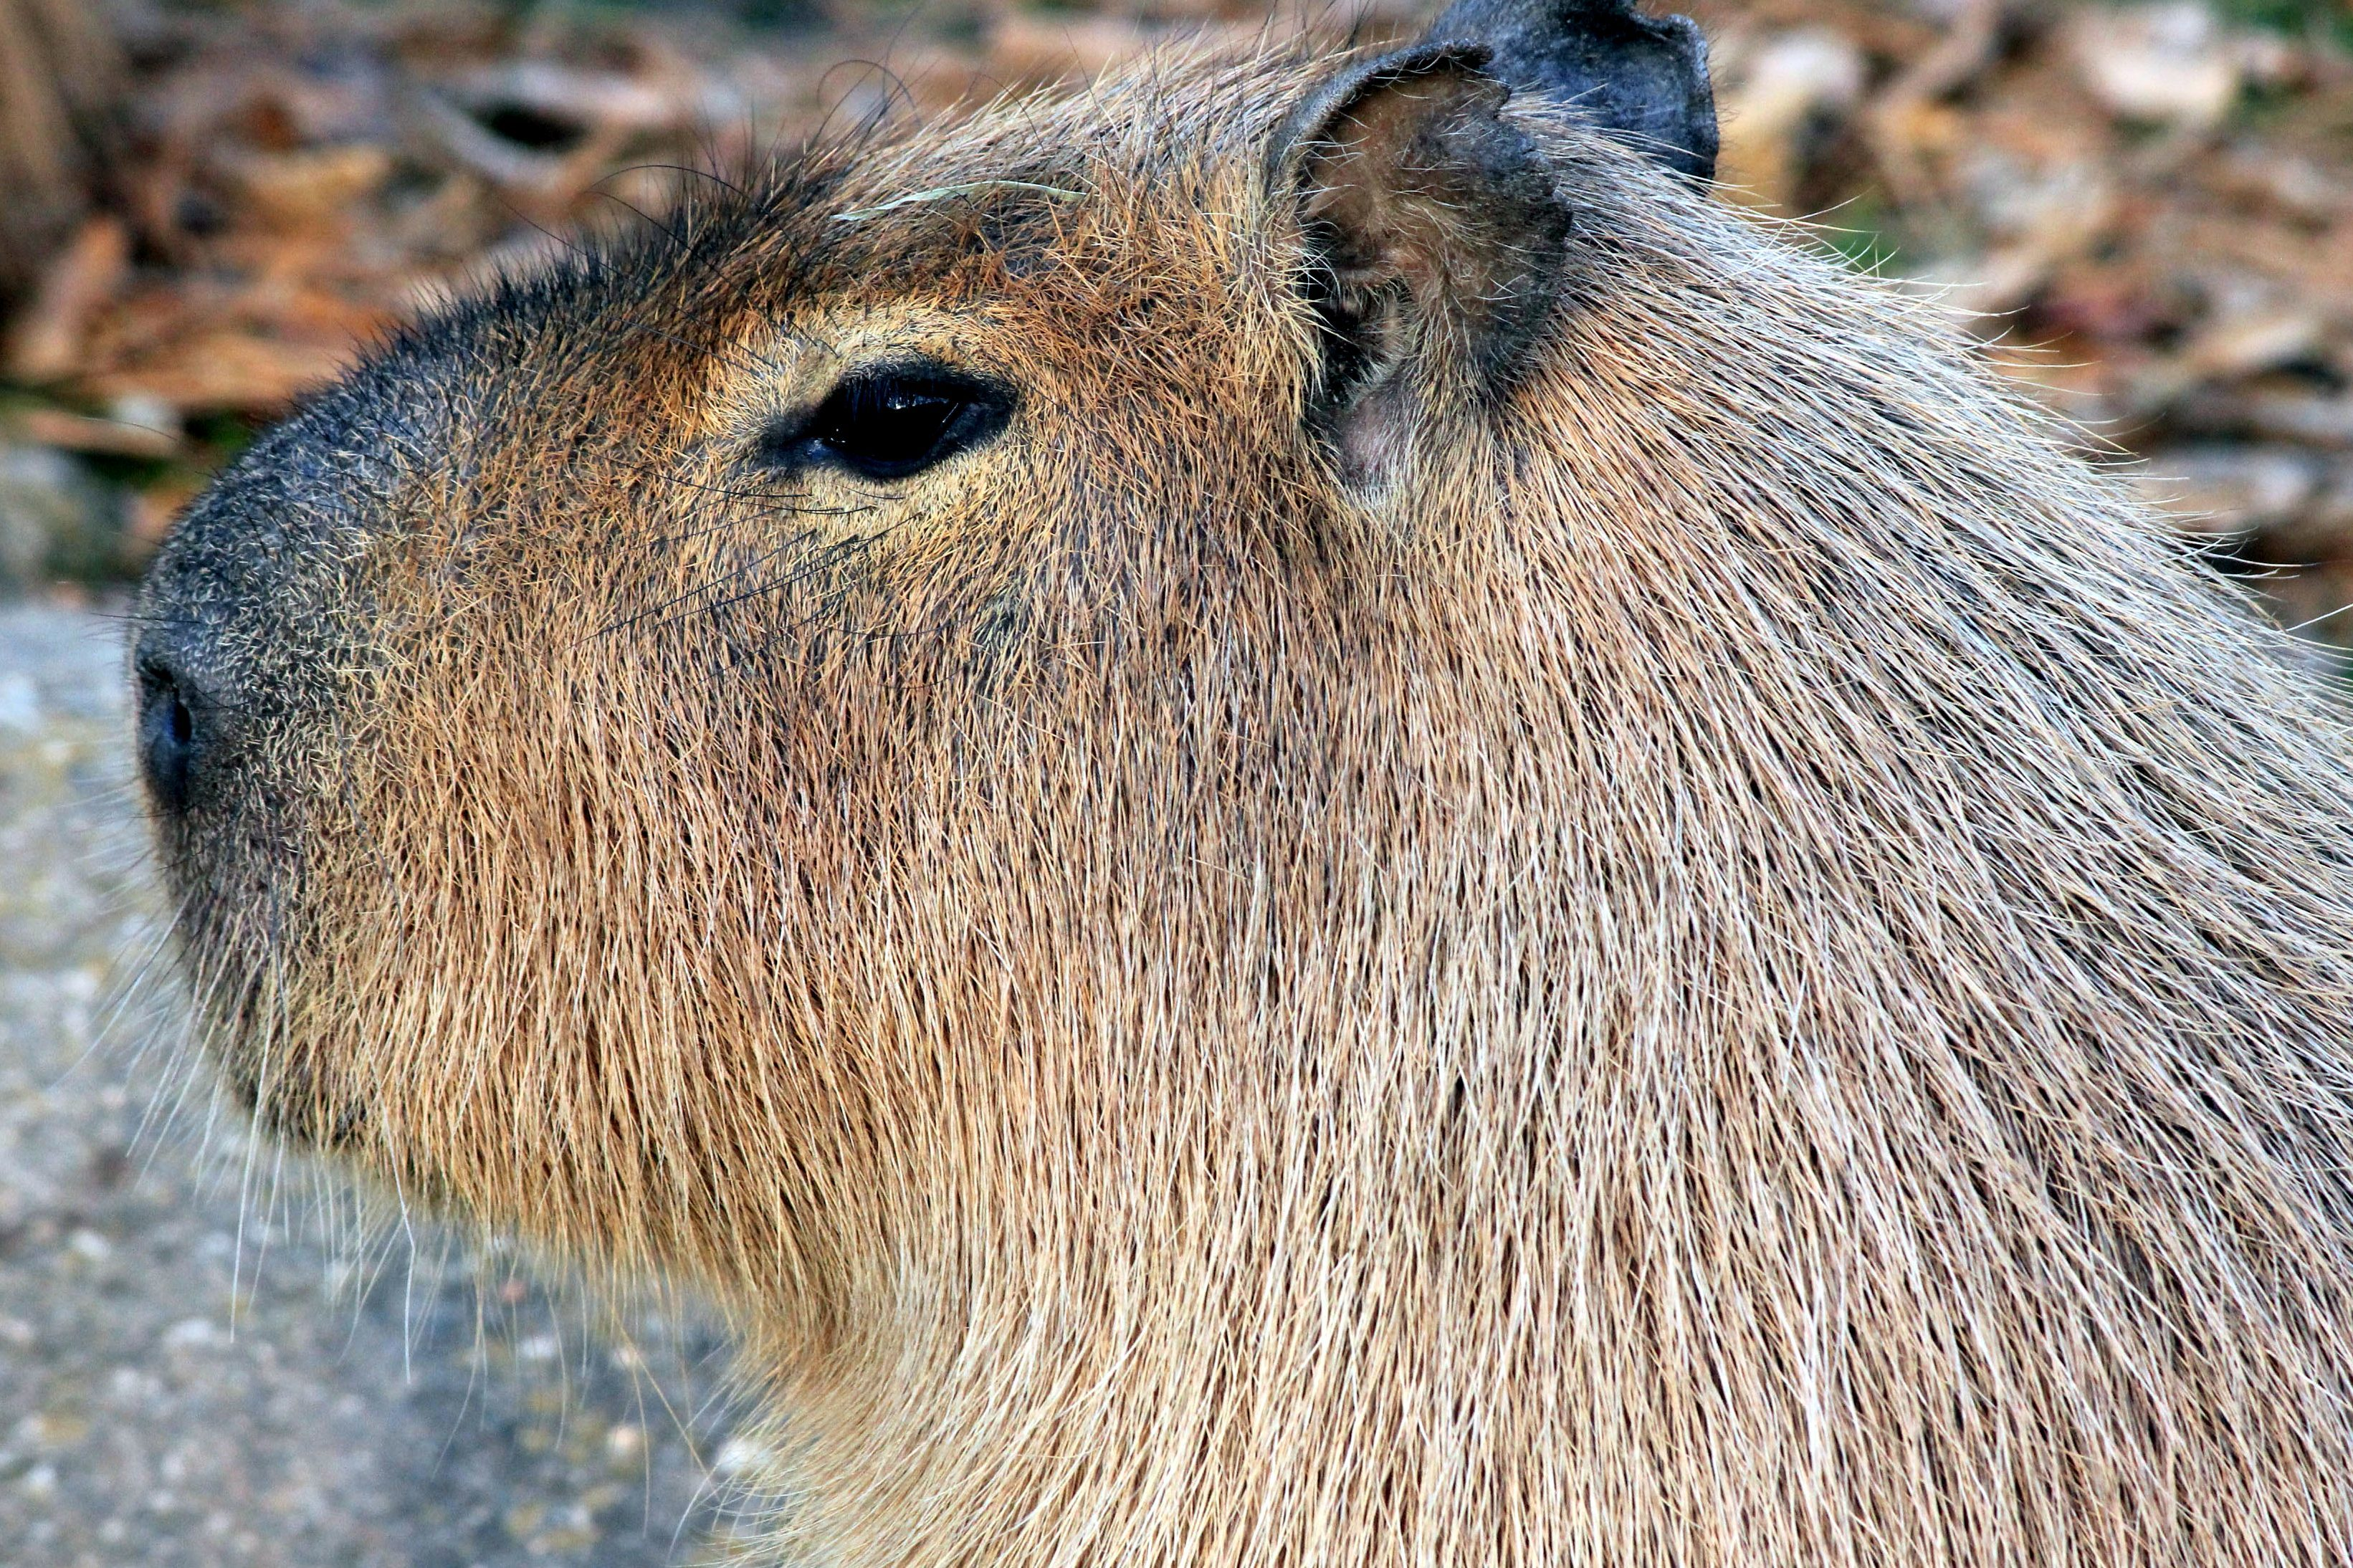 Image libre: capybara, rongeur, animal